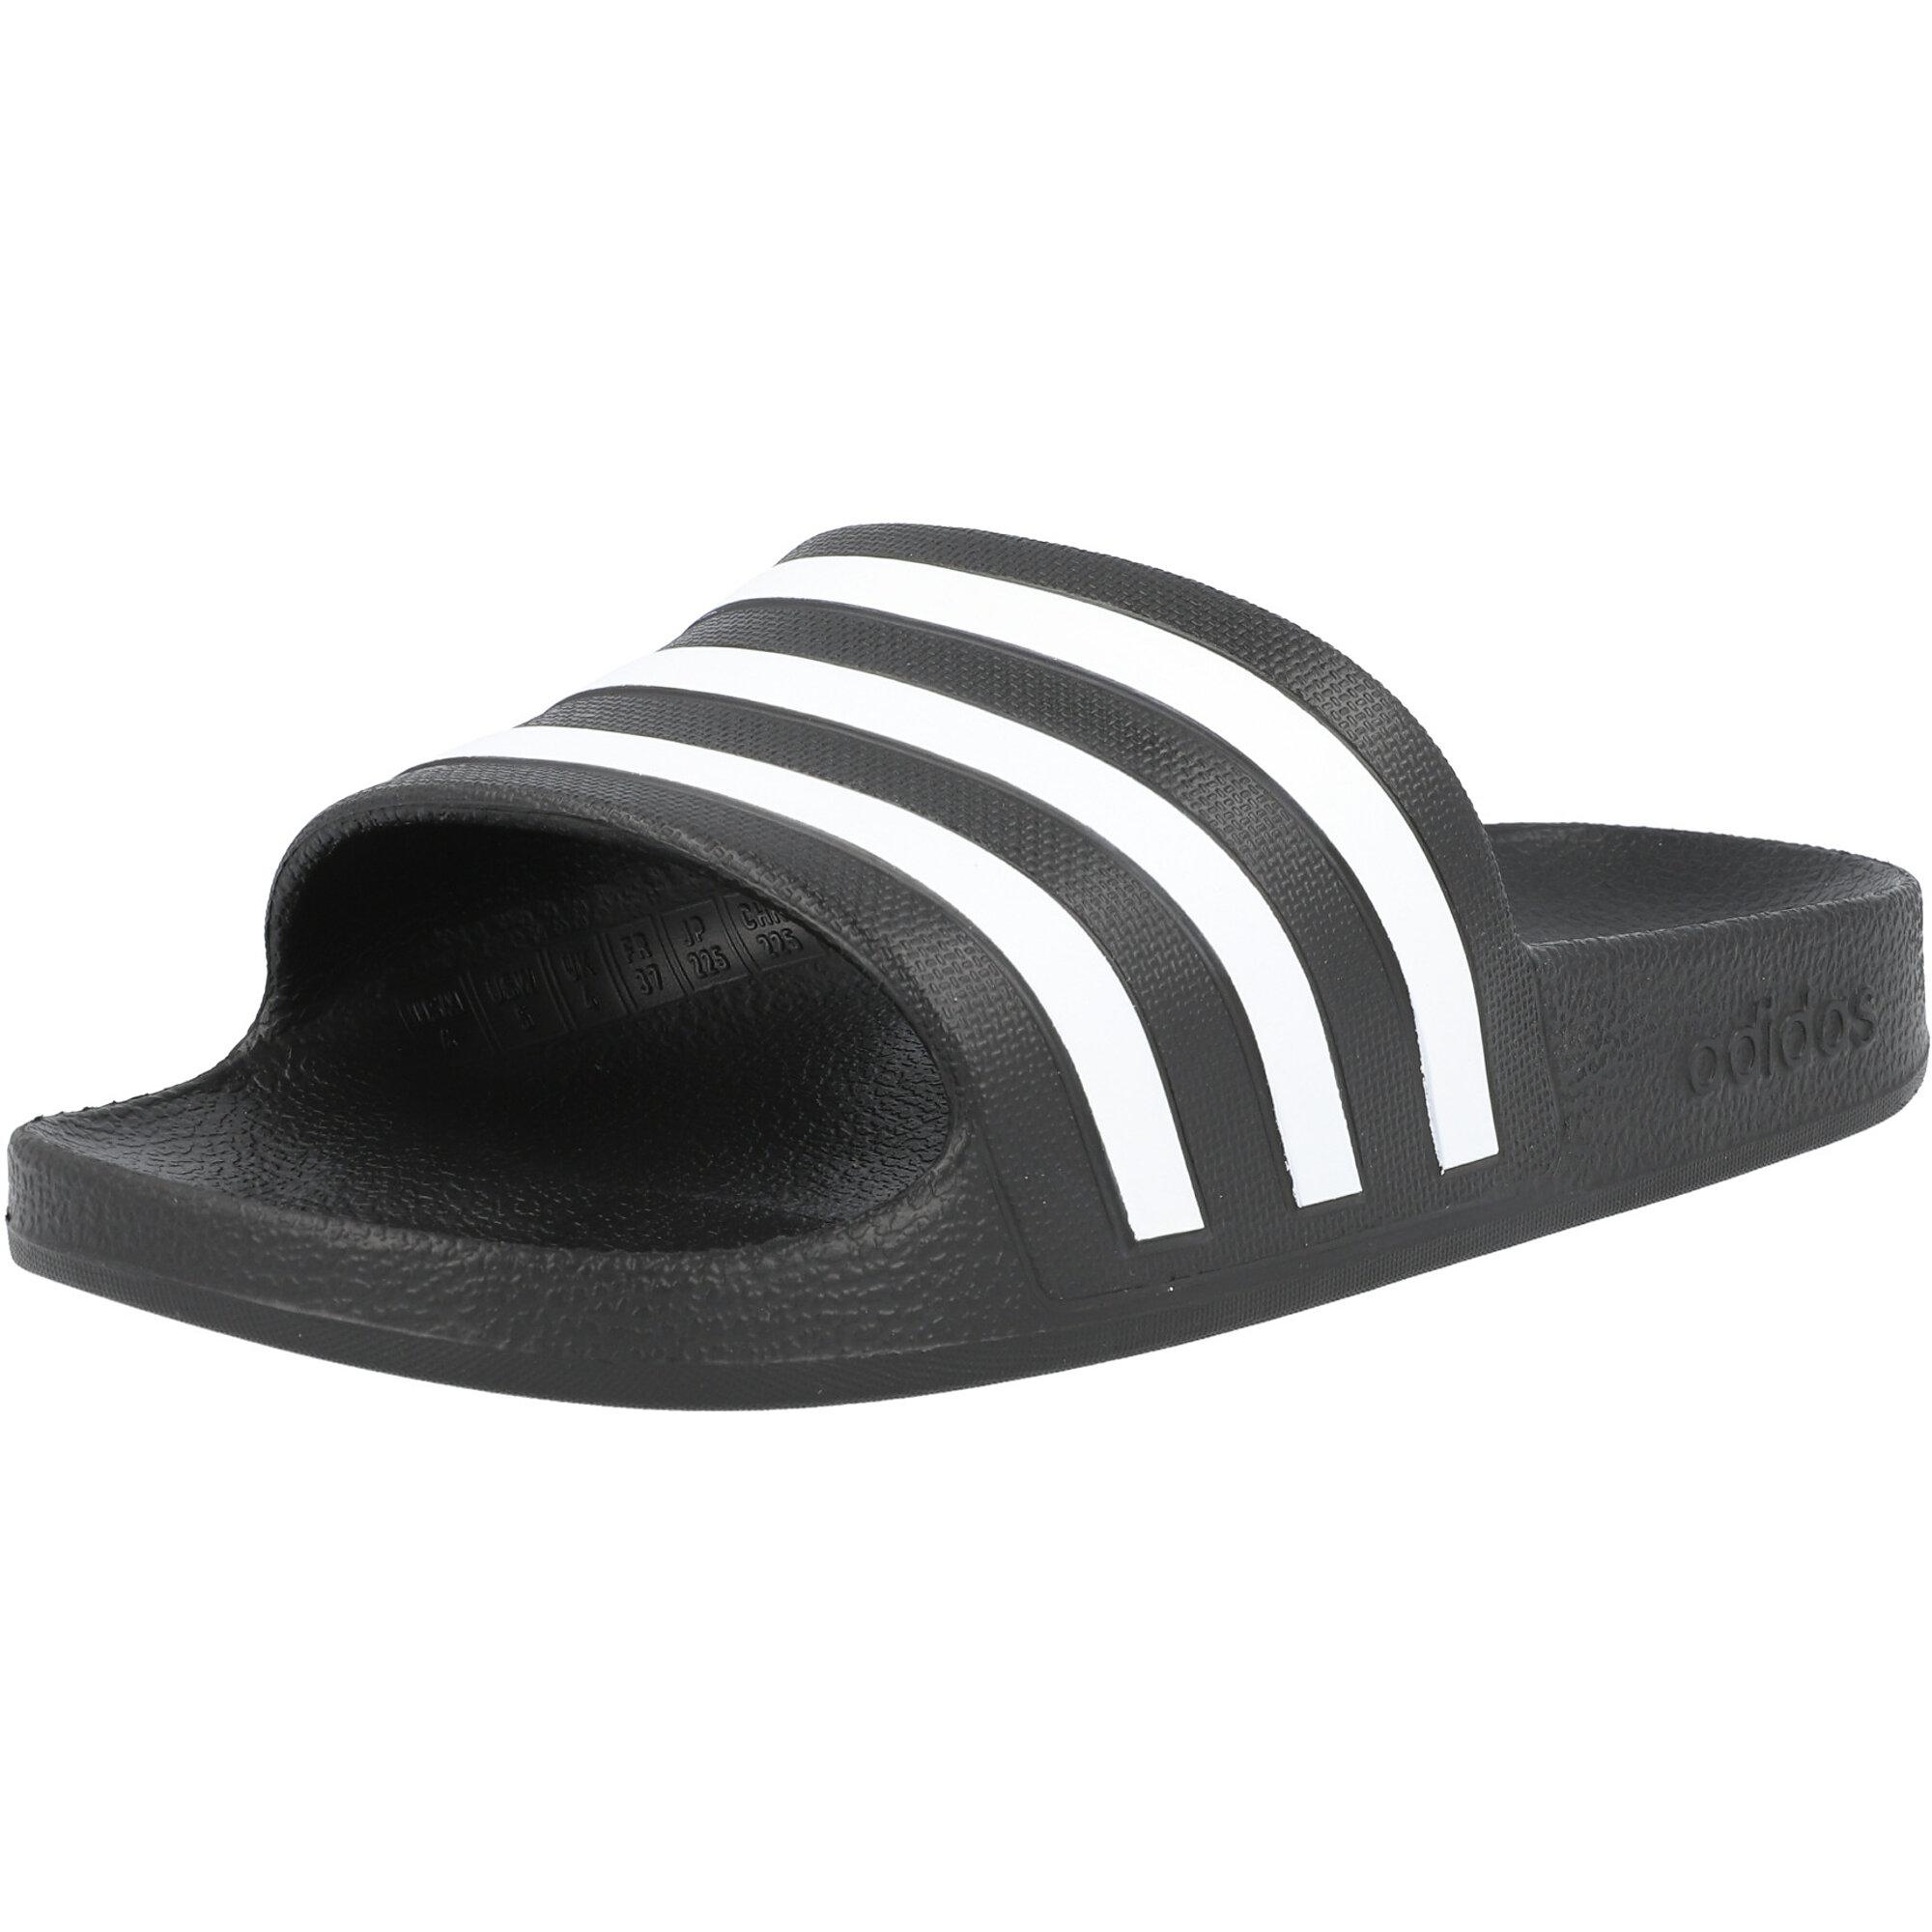 adidas adilette Aqua Core Black/White Synthetic